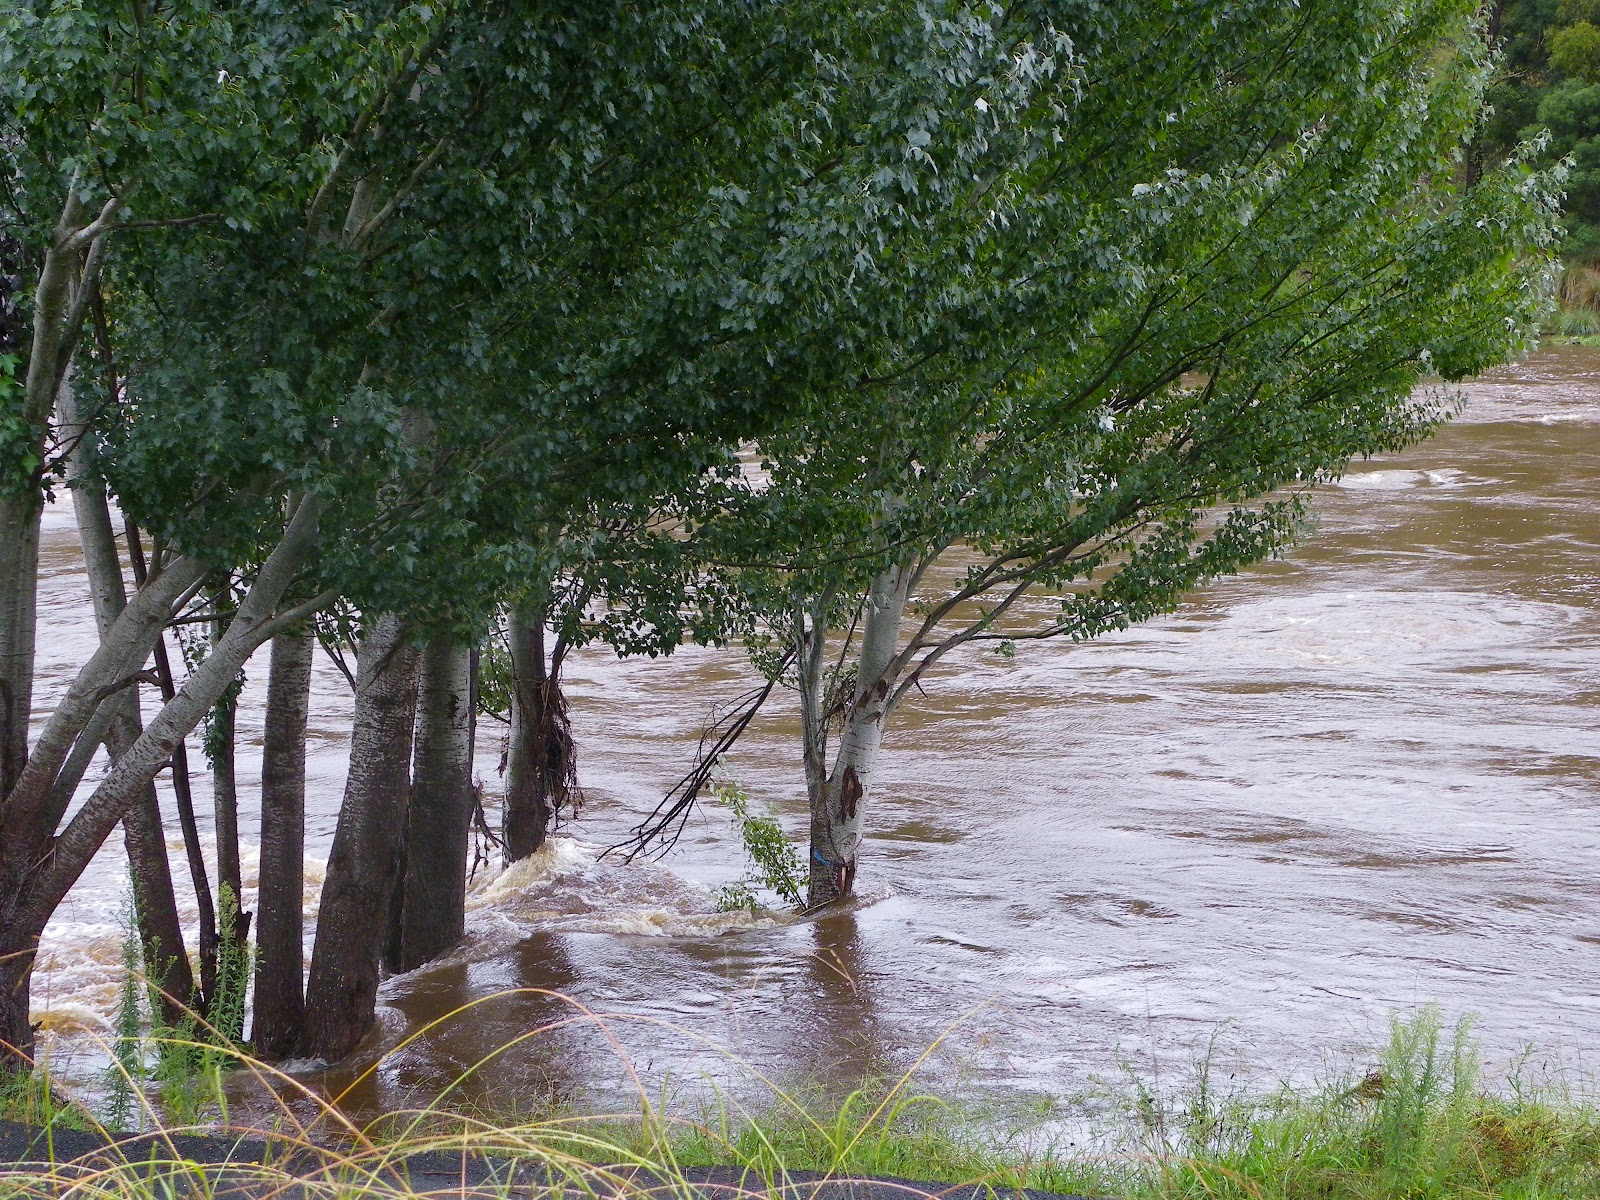 queanbeyan river - photo#33